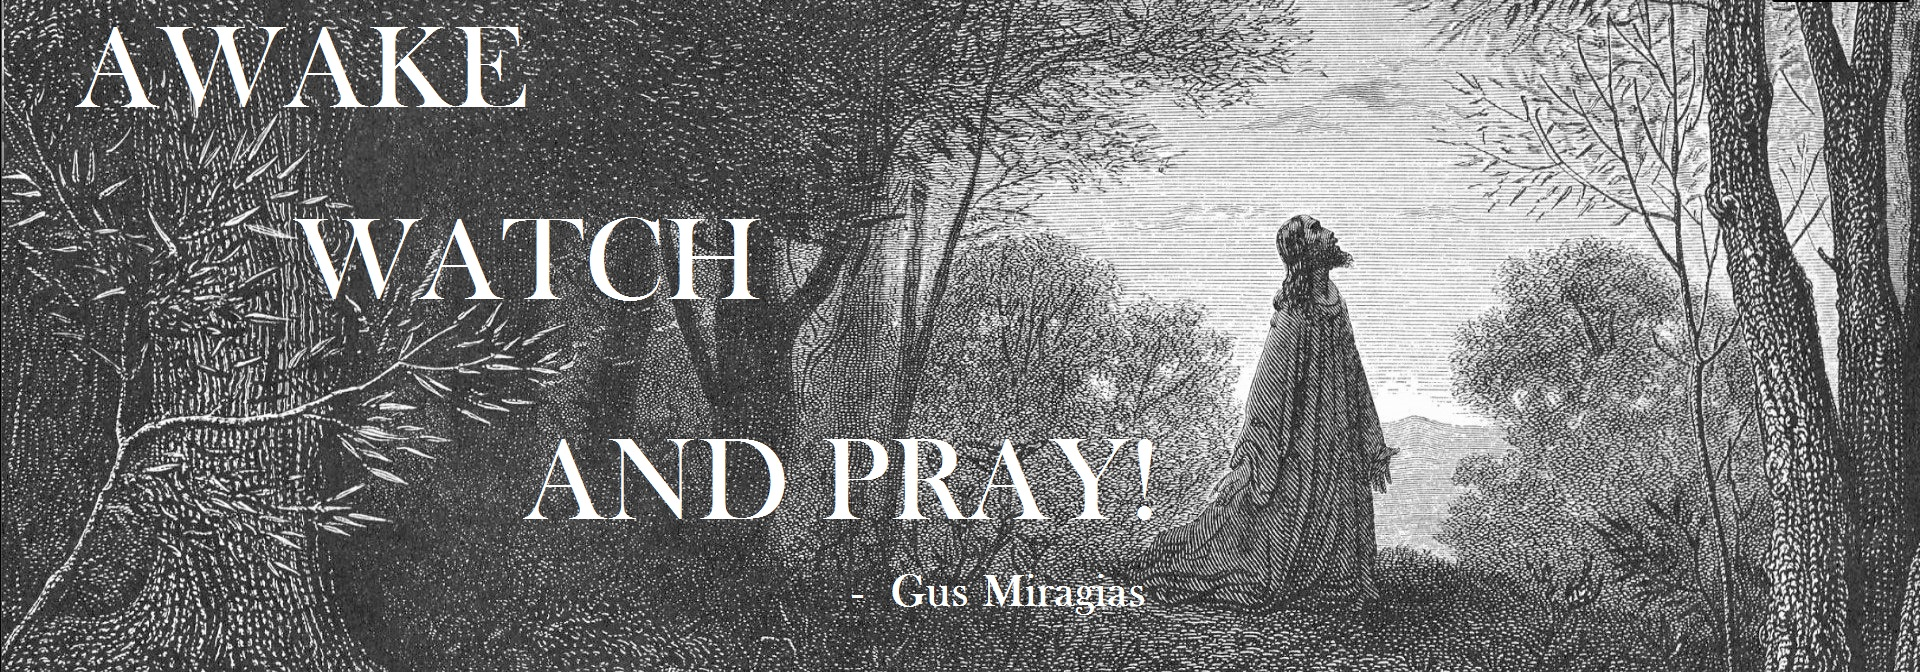 AWAKE, WATCH & PRAY! - by Gus Miragias